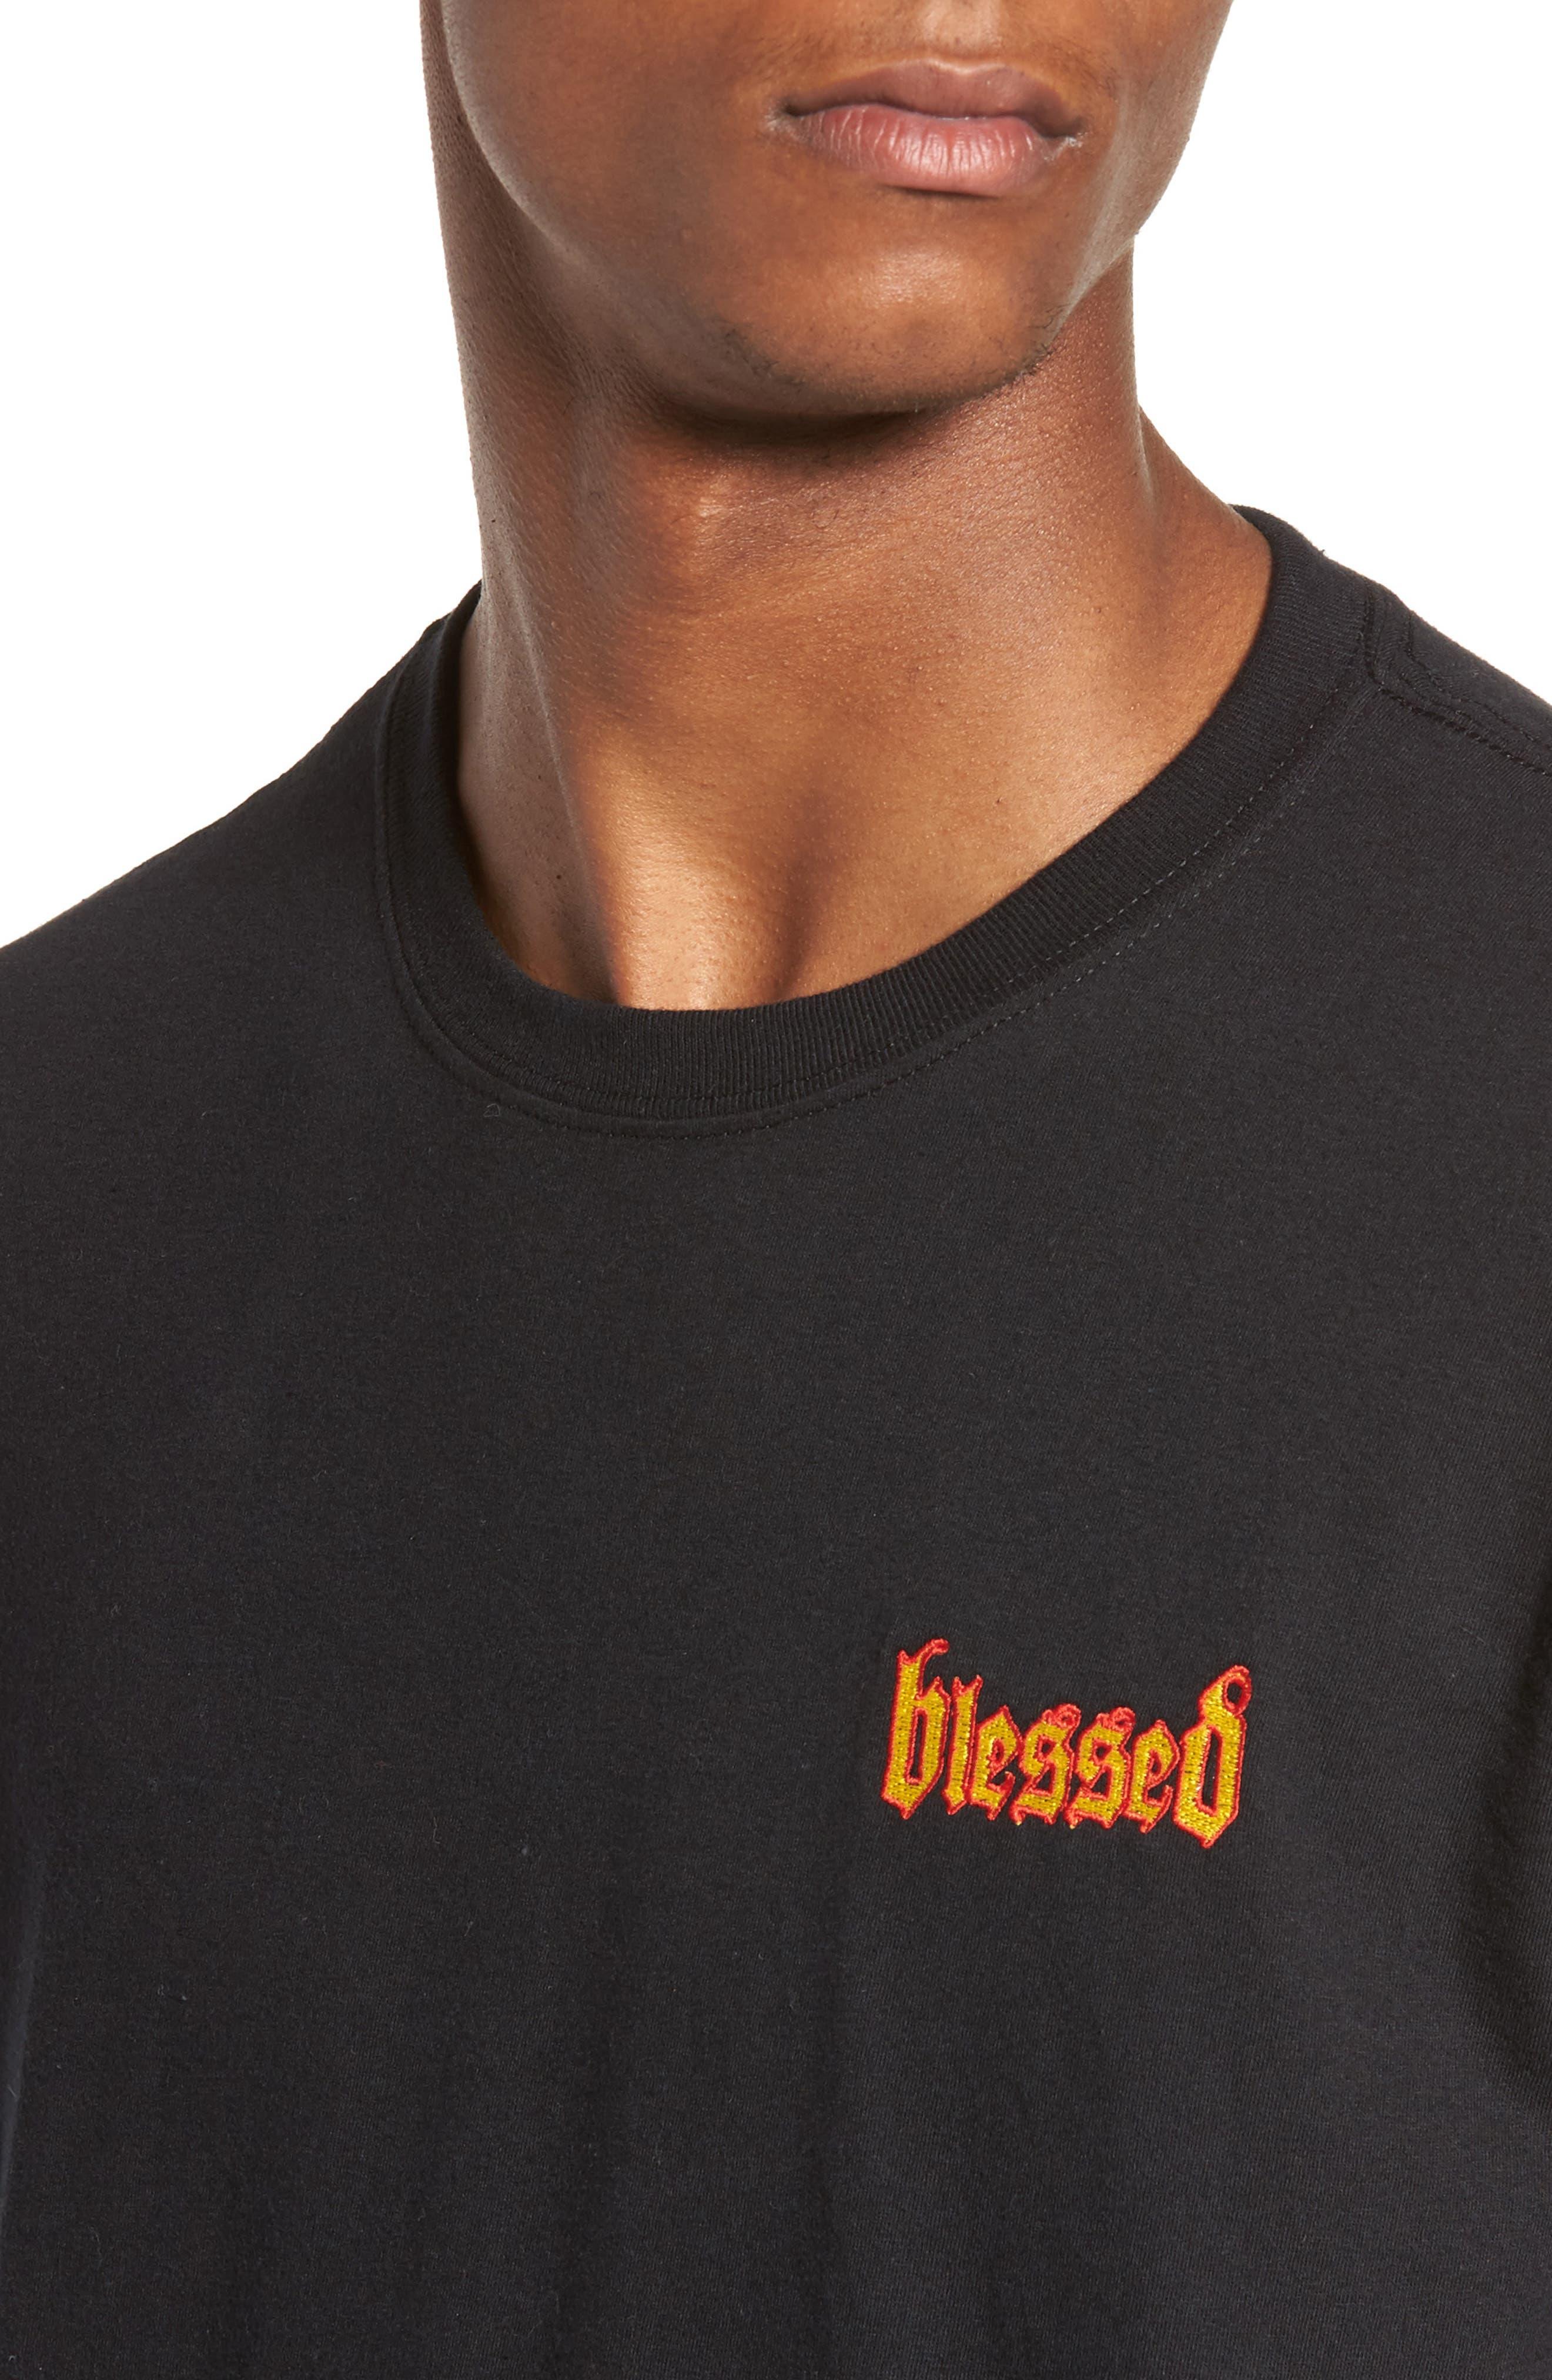 Blessed T-Shirt,                             Alternate thumbnail 4, color,                             Black Blessed